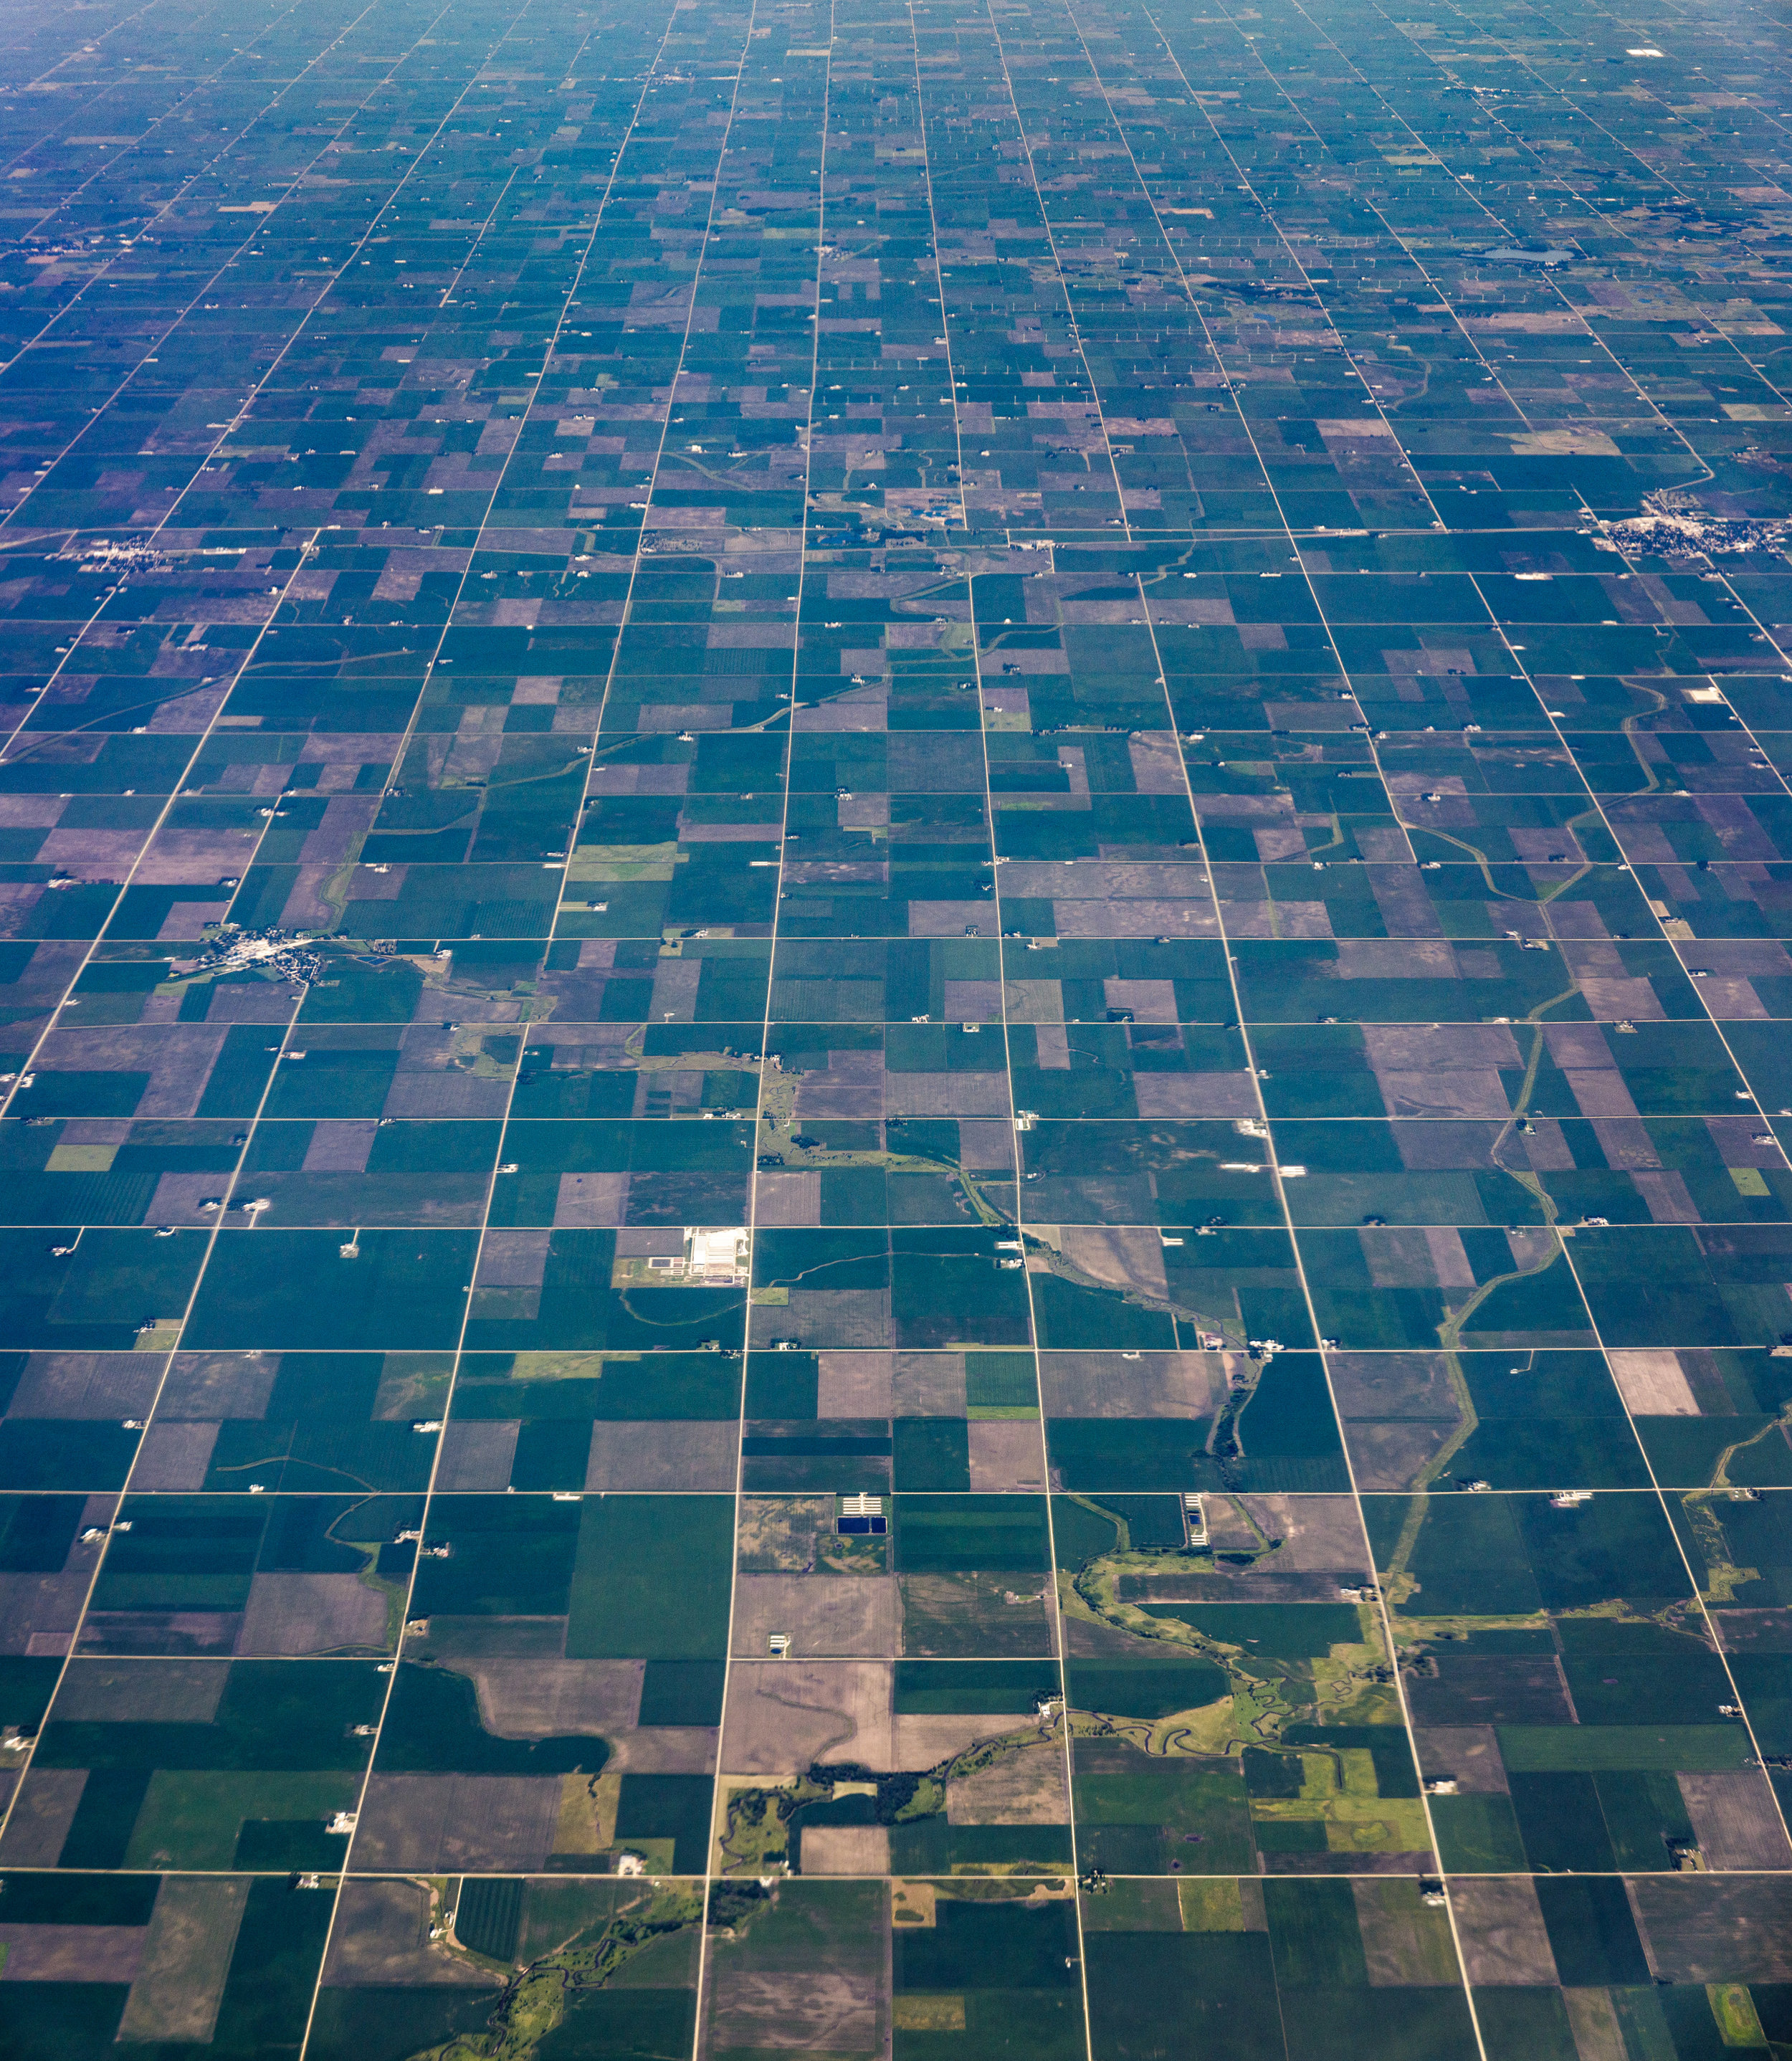 "Hancock County Iowa  (   Latitude 42°56'21"" N Longitude 93°52'24"" W   )  by Dennis Dimick, July 6, 2017."